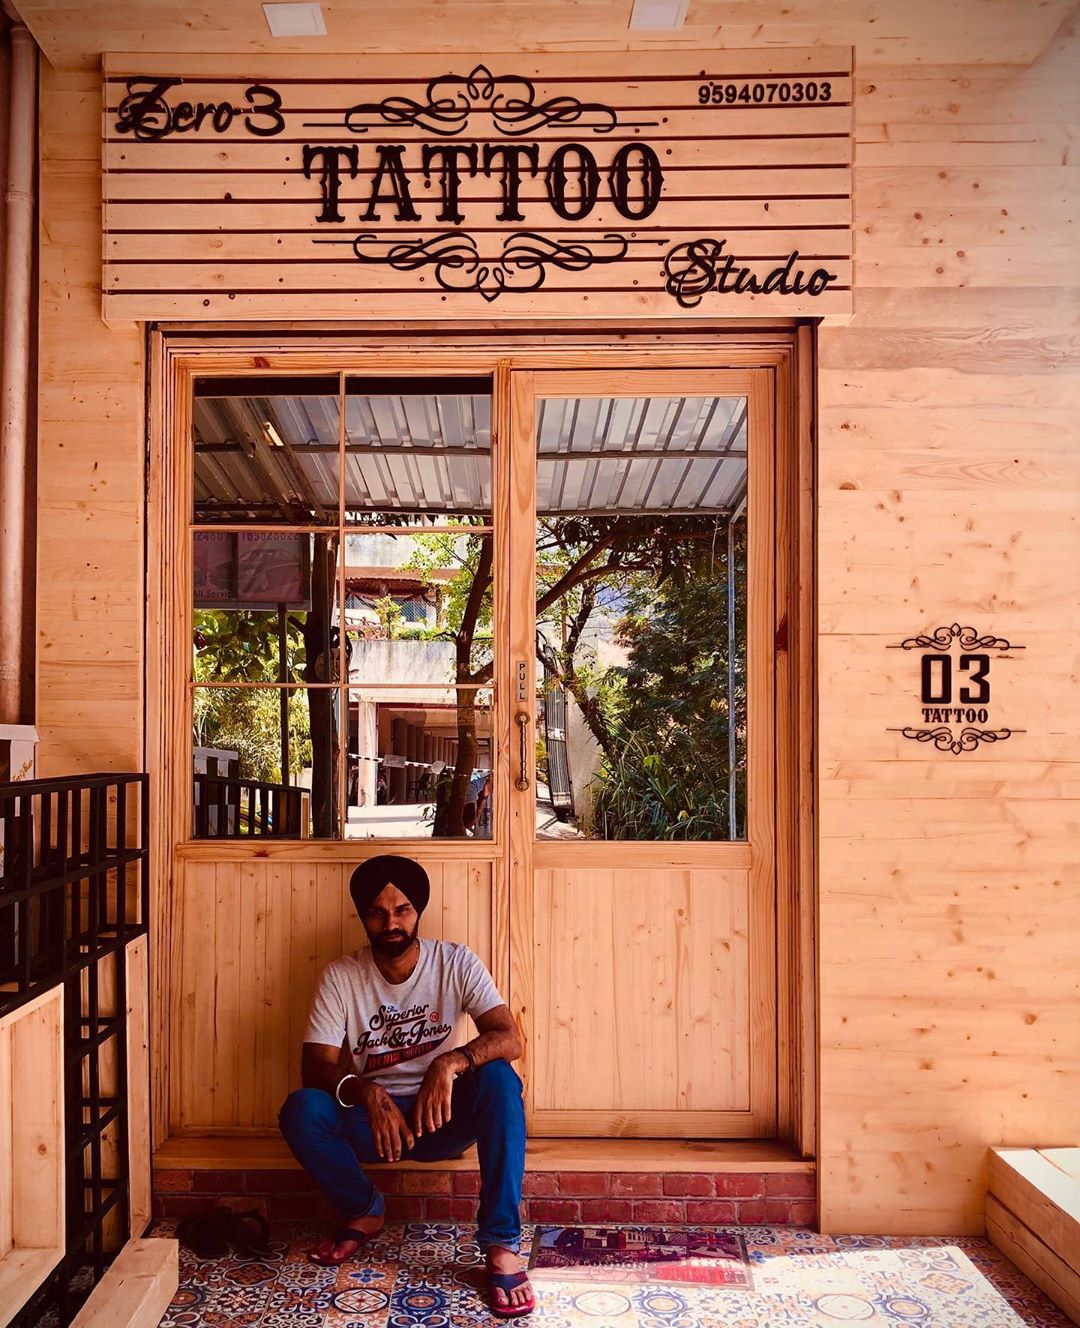 Zero3 Tattoo Studio